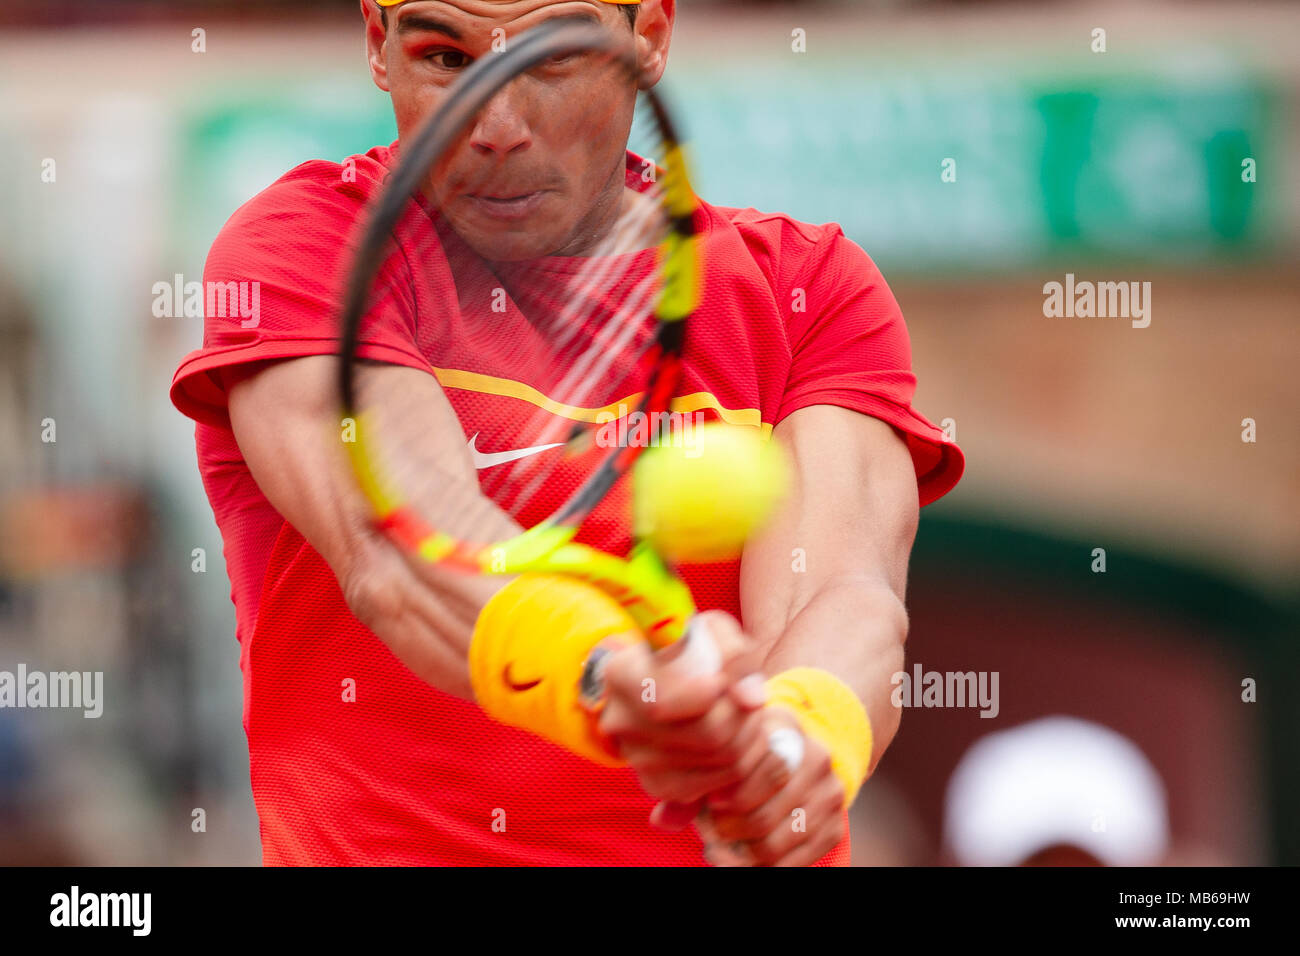 Spanish tennis player Rafael Nadal Stock Photo